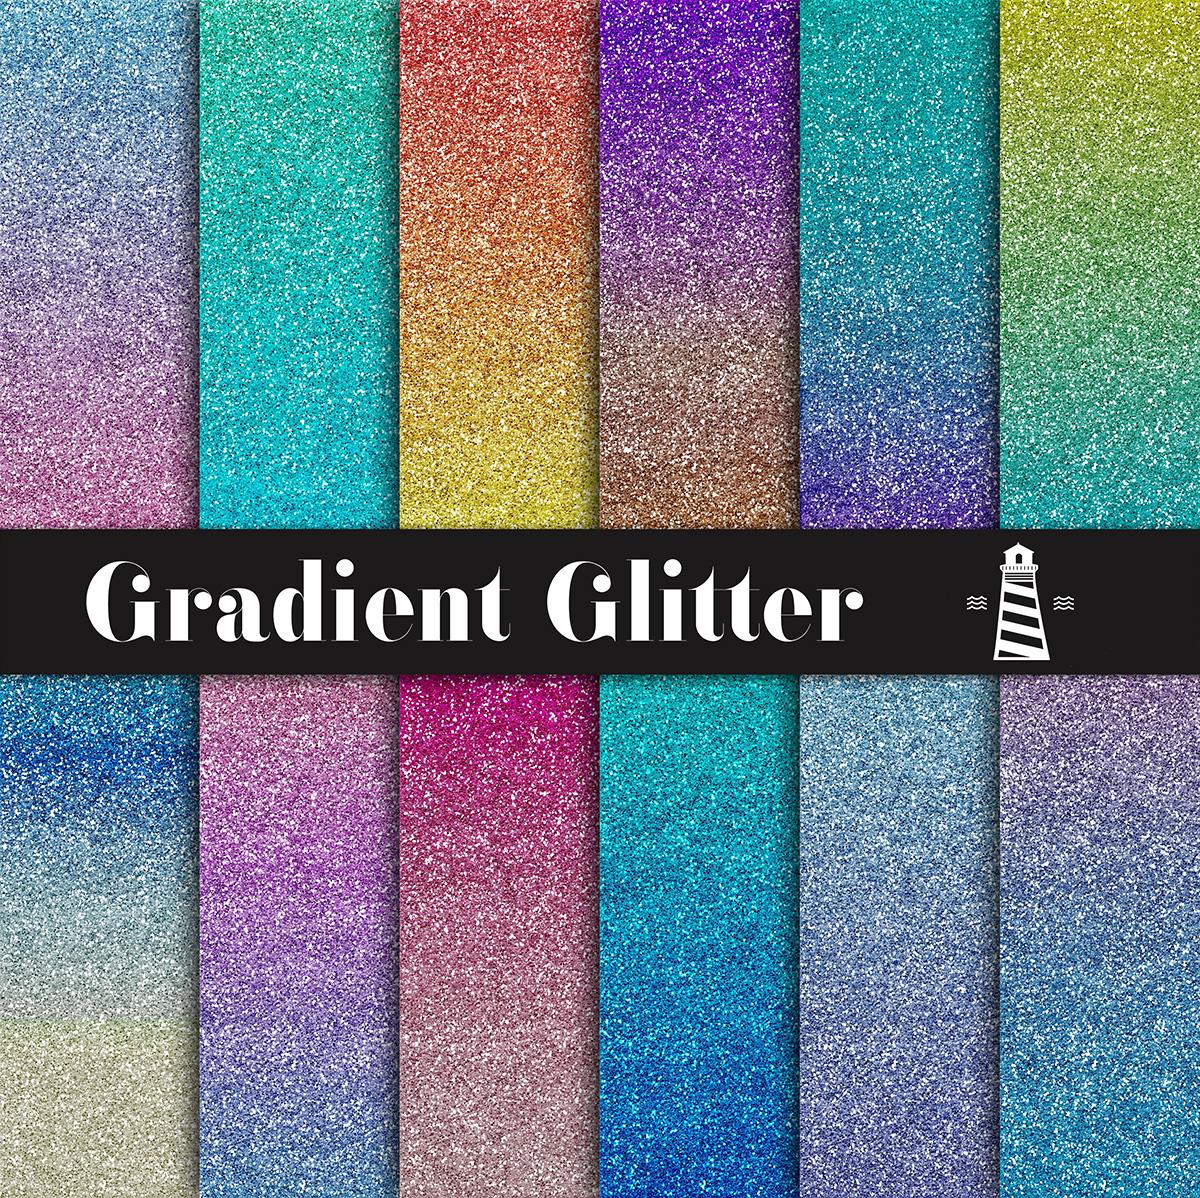 Gradient Glitter Digital Paper example image 1